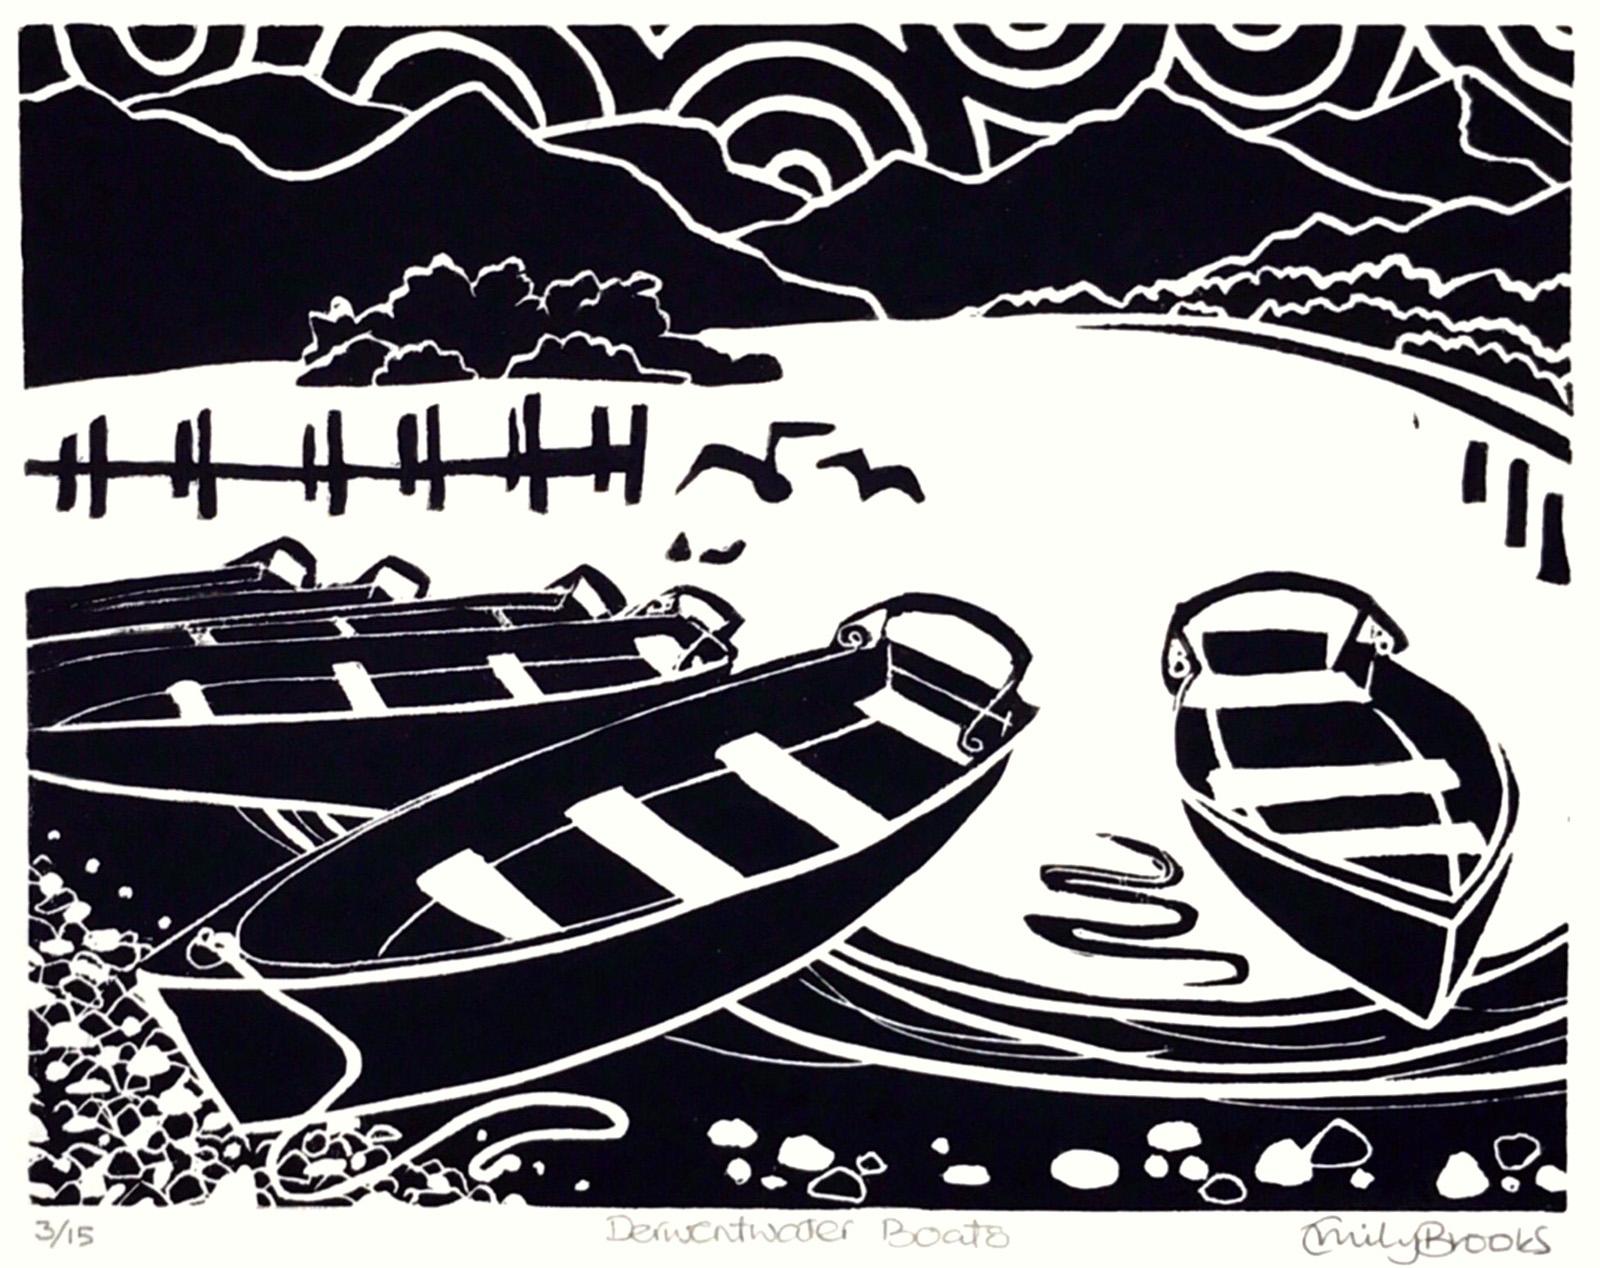 Derwentwater Boats. Linocut print by Emily Brooks